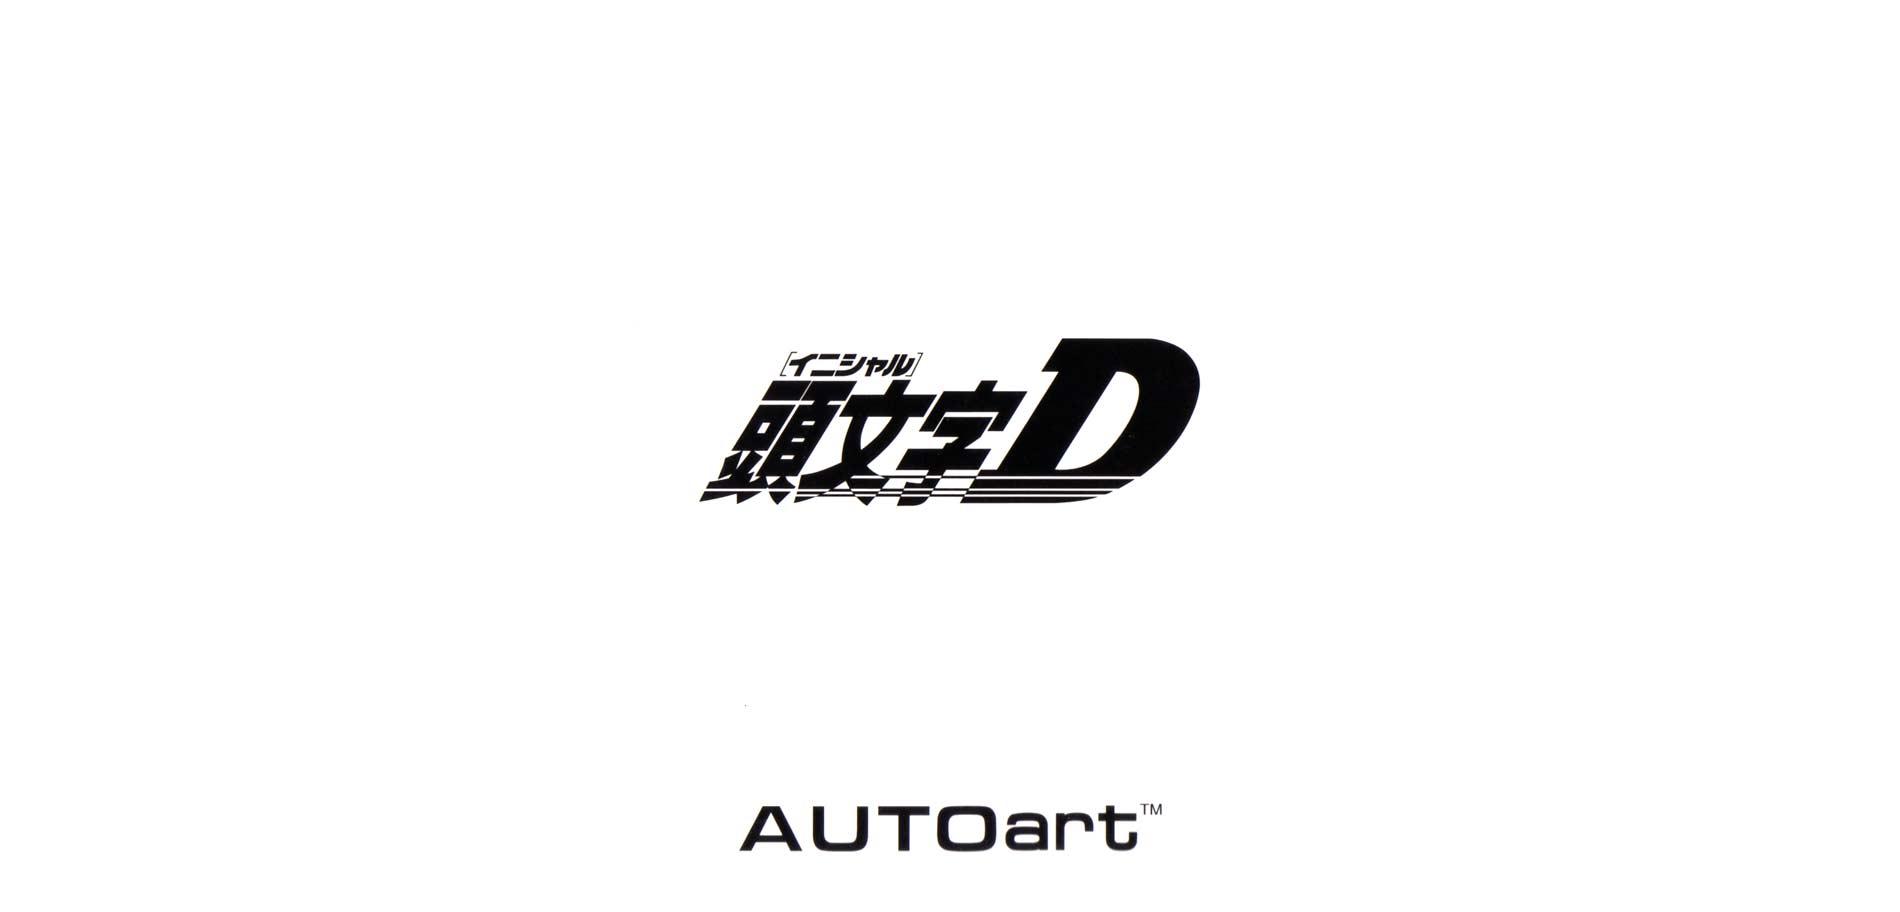 packaging dessus de la Toyota AE 86 - AUTOart - Initial D